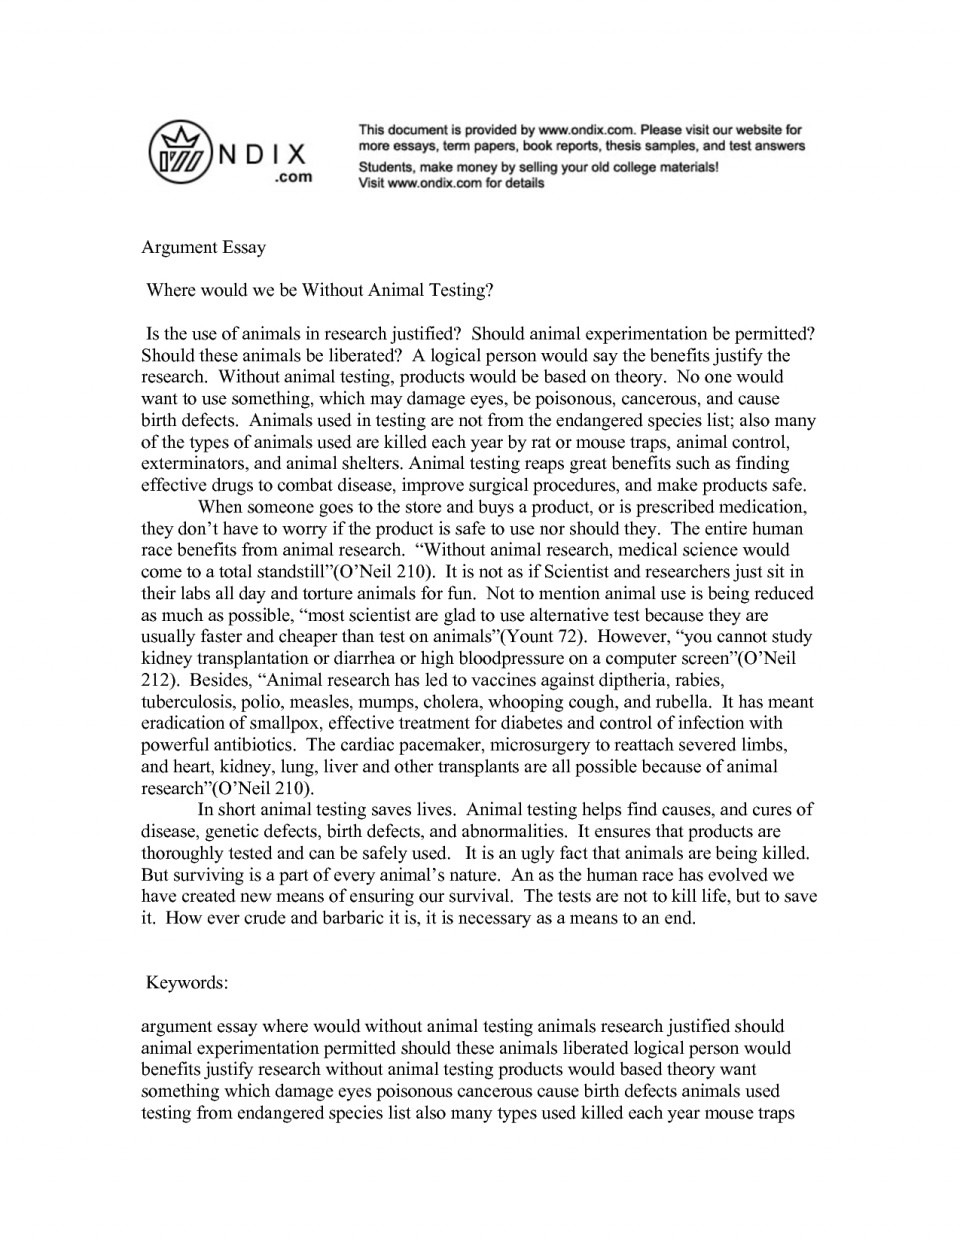 Kurt vonnegut cats cradle essays